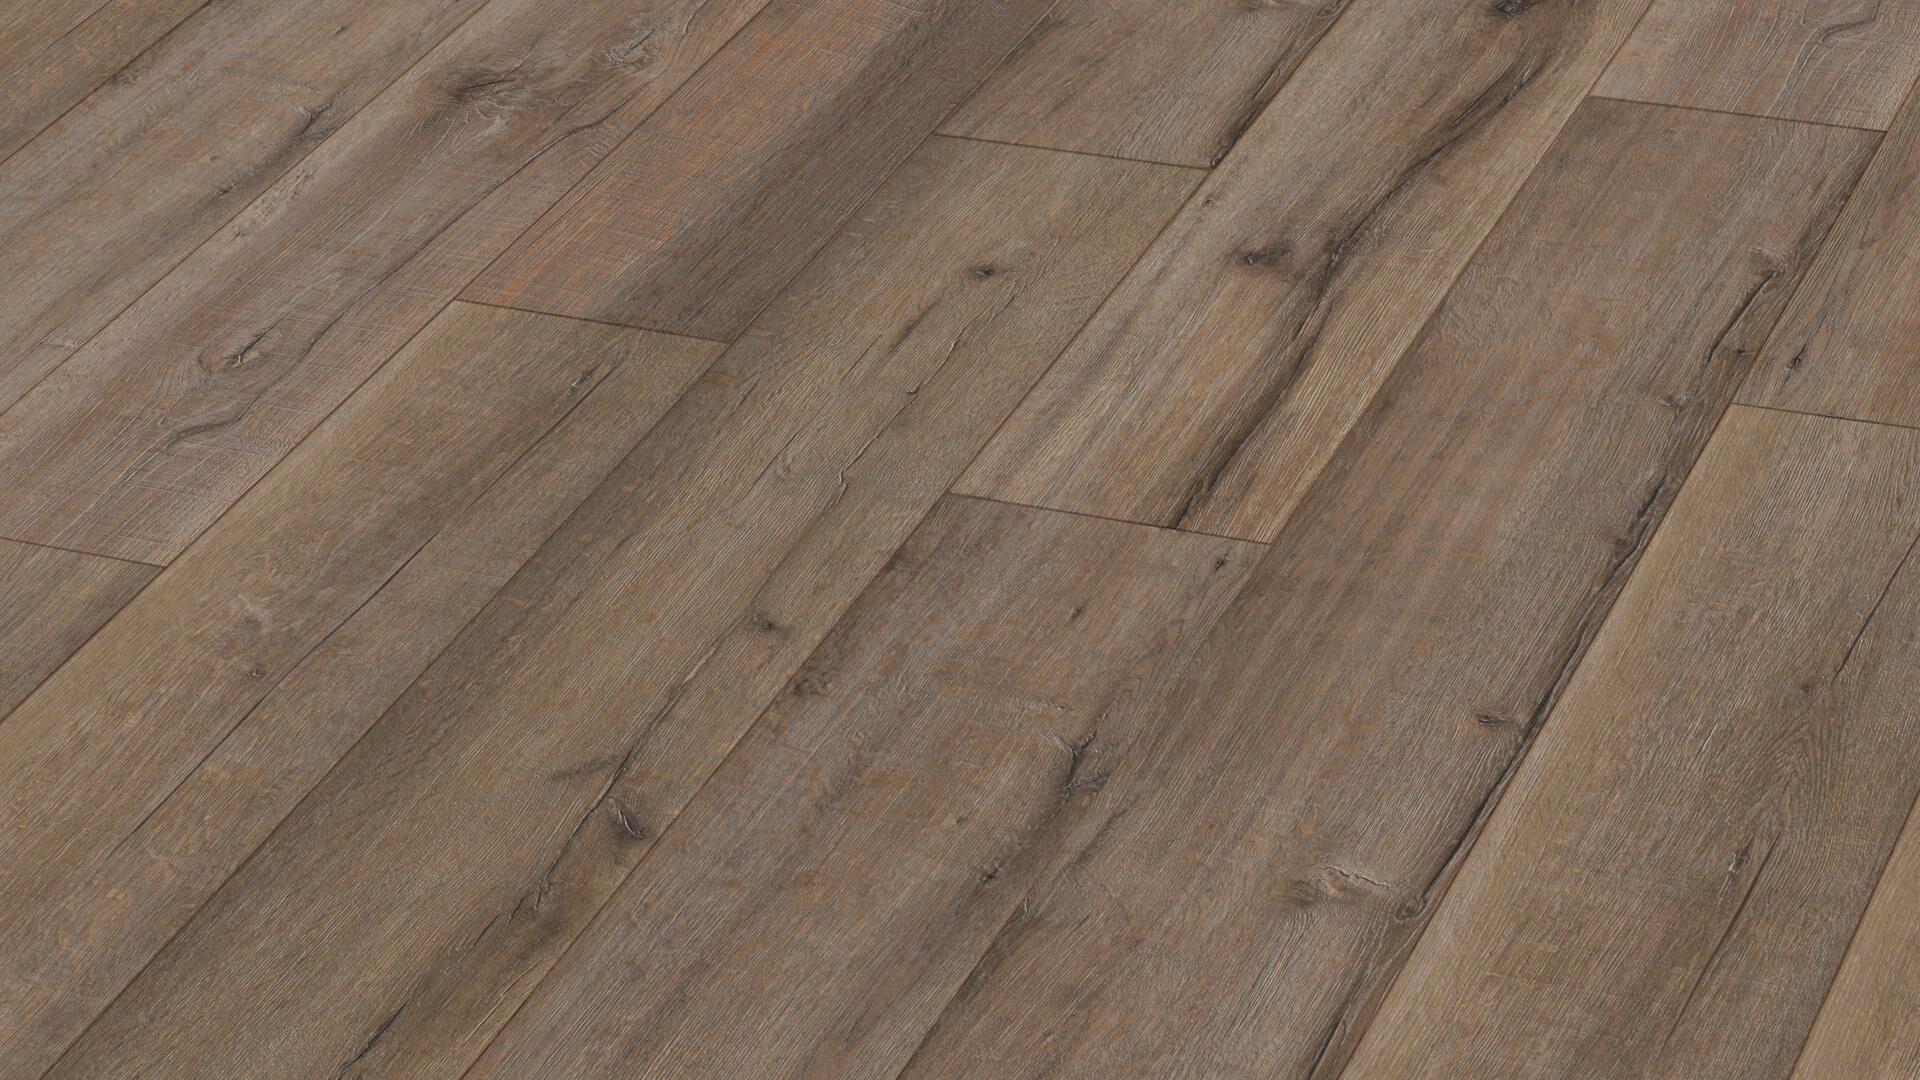 Designvloer MeisterDesign. comfort DD 600 S Eik oud hout leemgrijs 6986